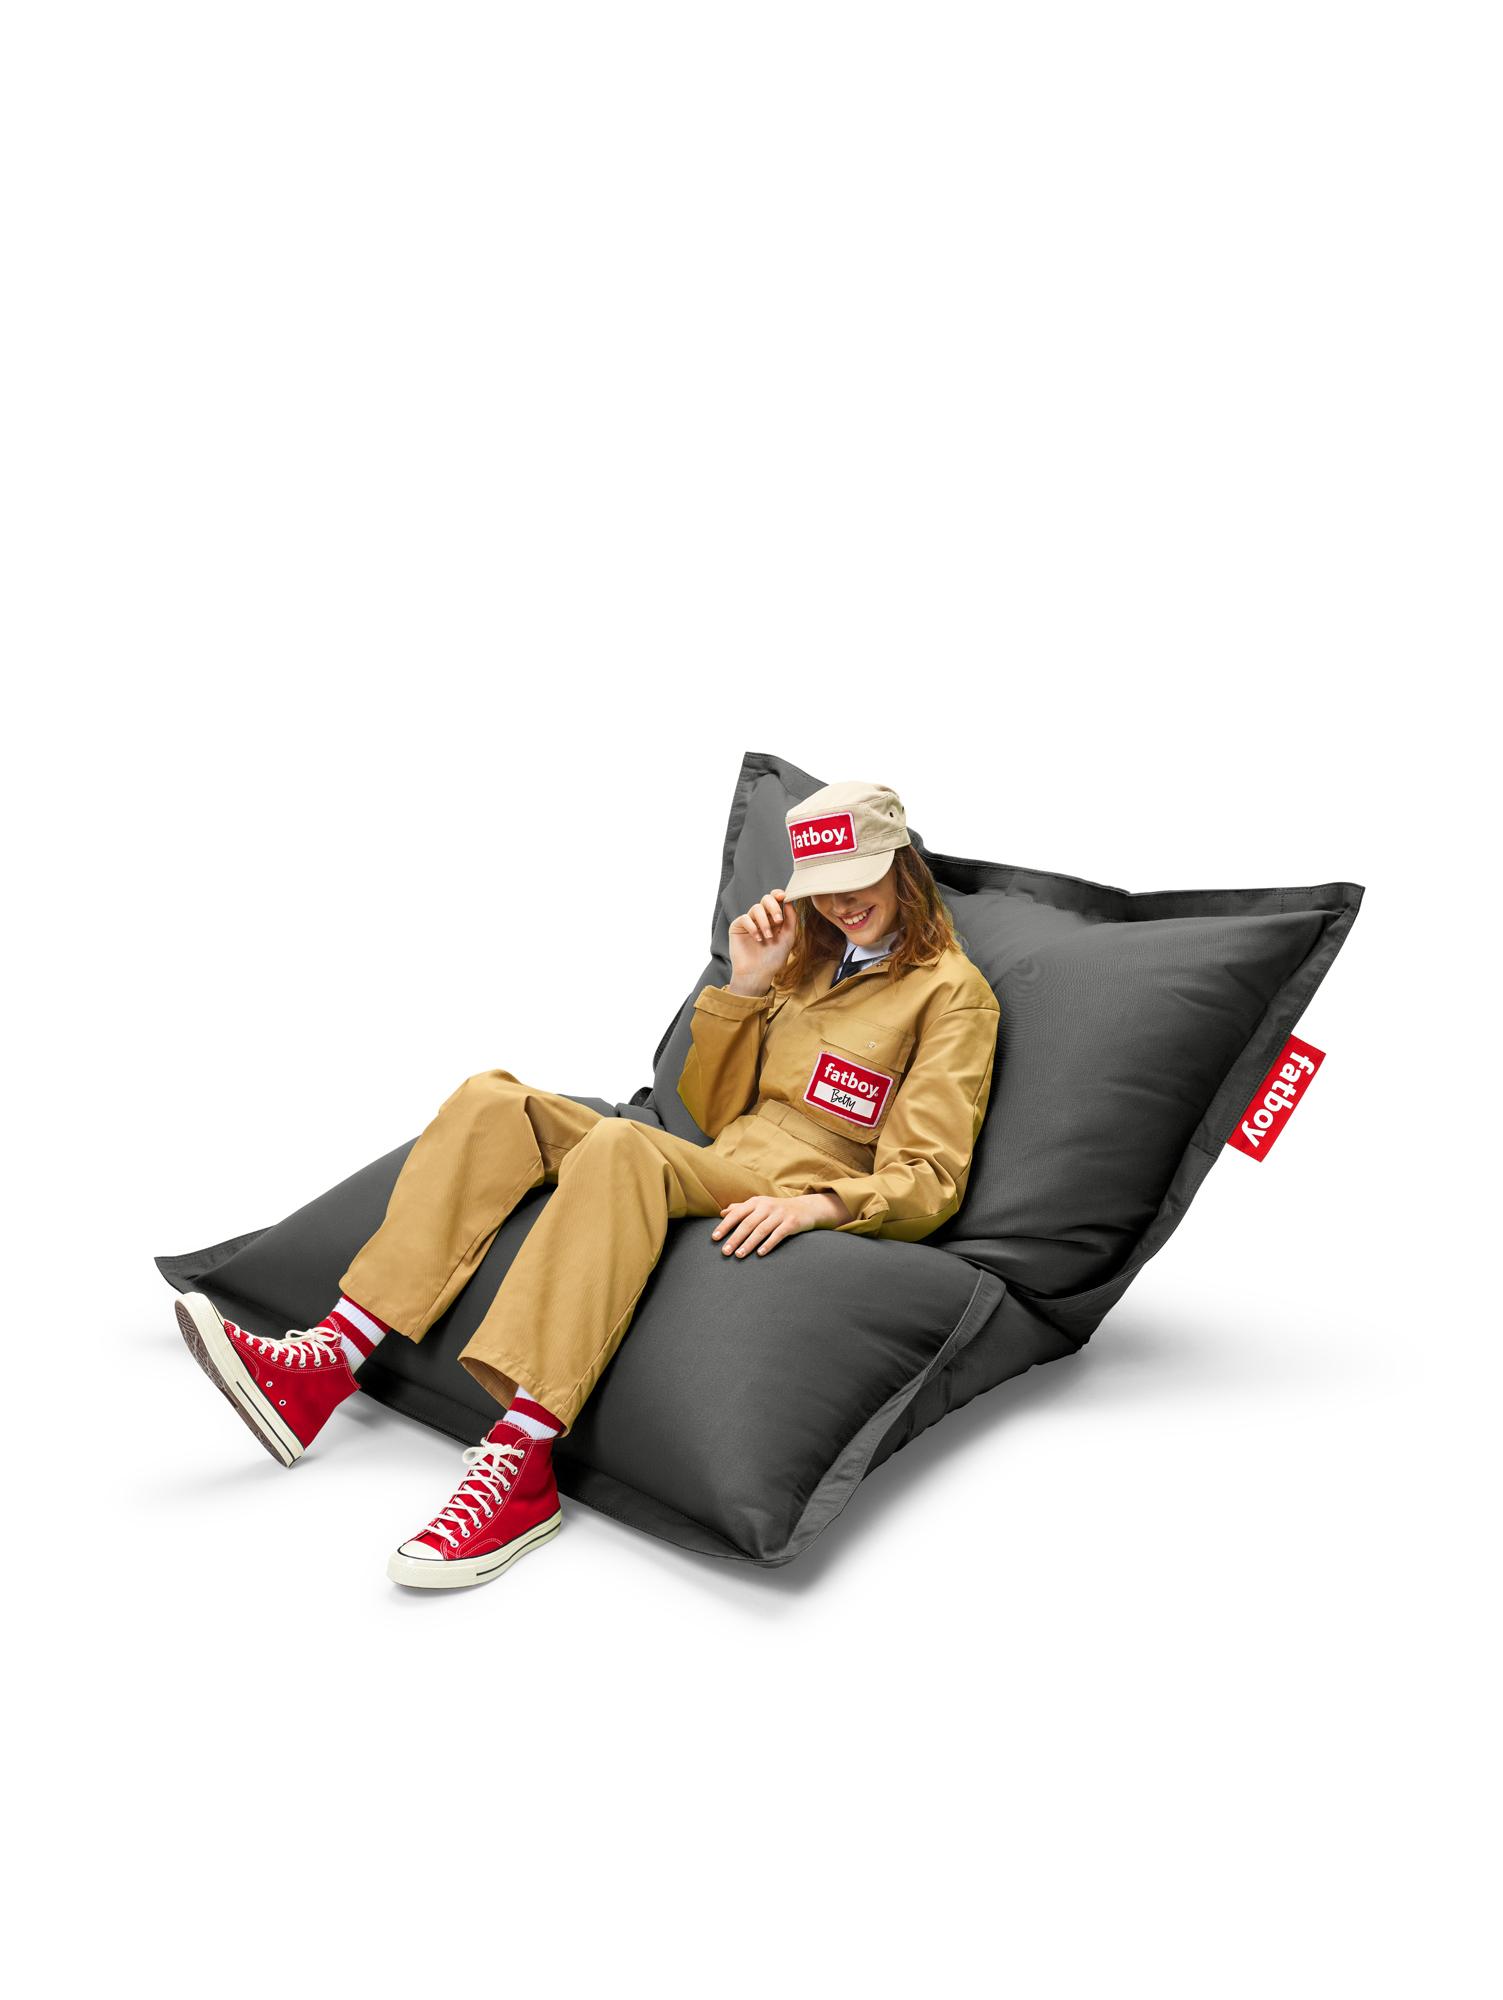 fatboy Outdoor-Sitzsack Original Charcoal